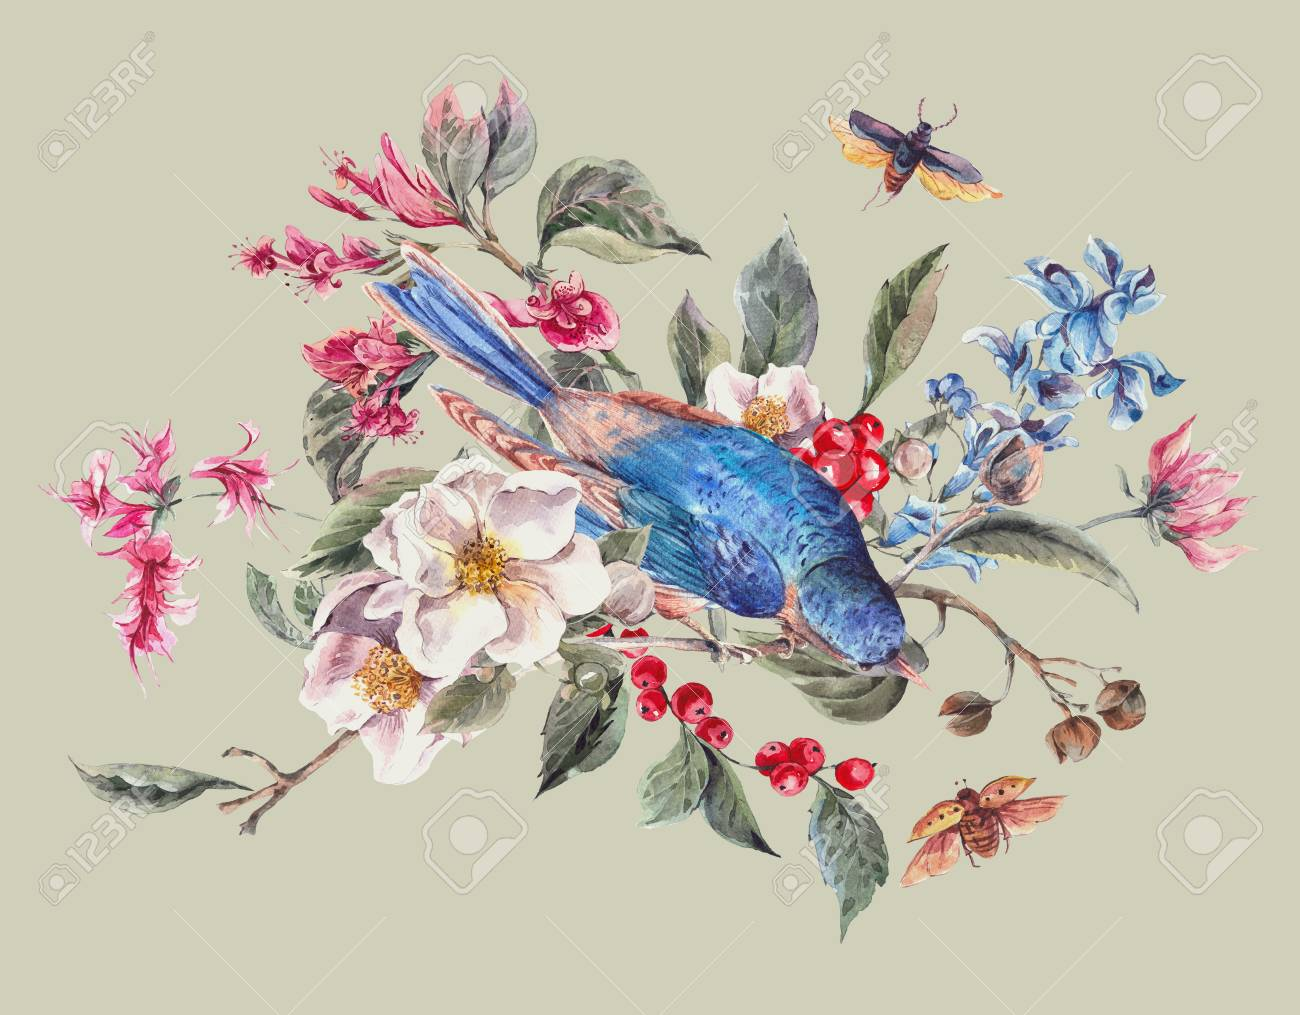 Watercolor Spring Vintage Greeting Card With Gentle Pink